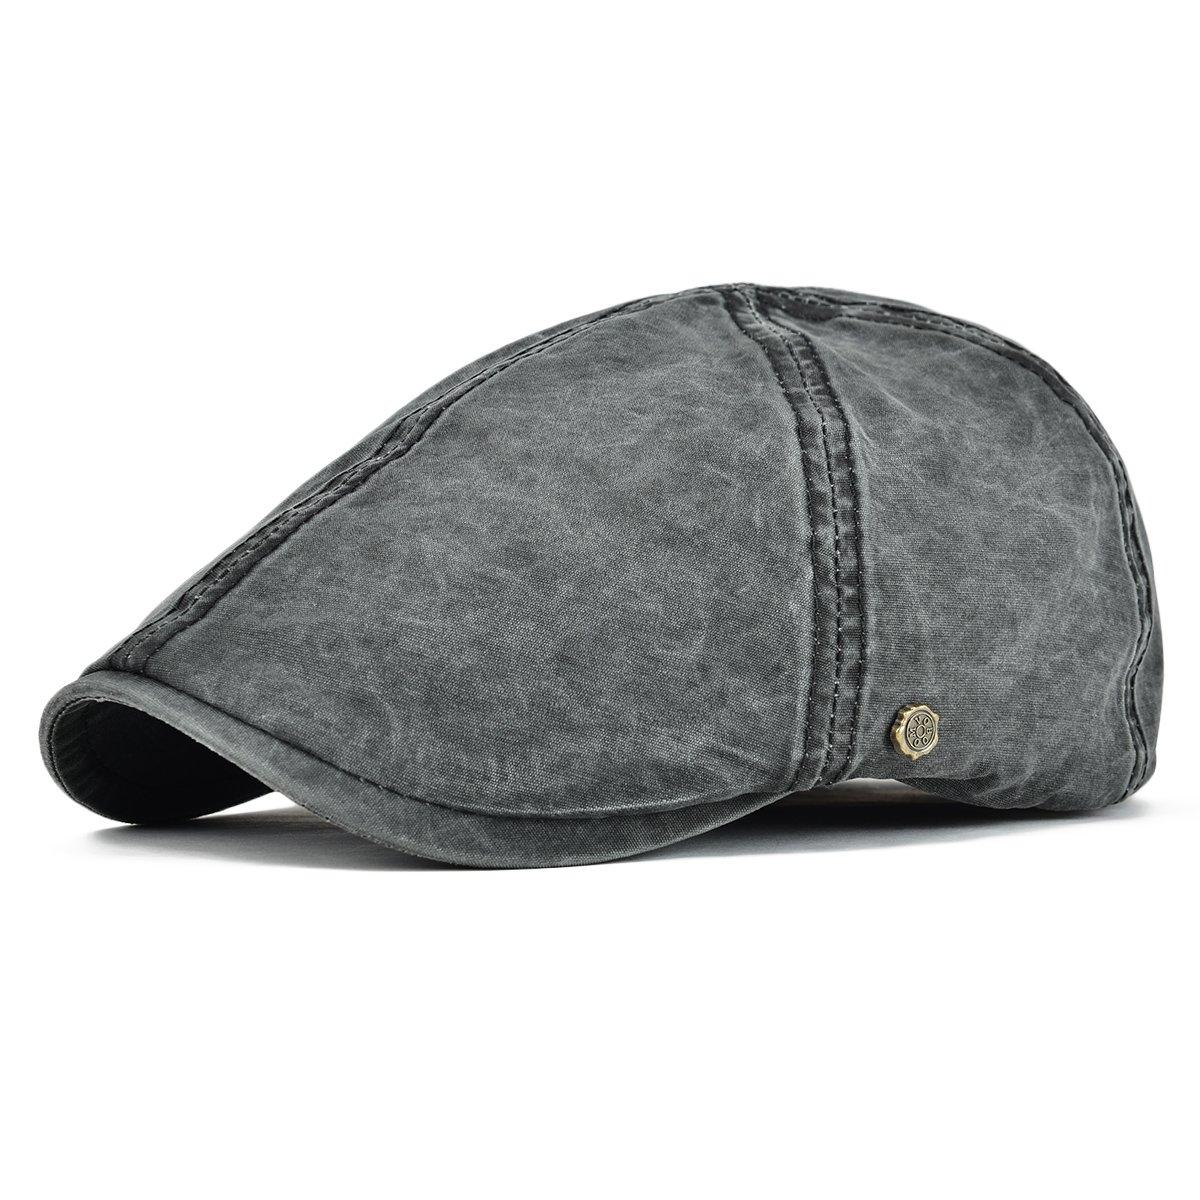 da43e8bb25c Galleon - VOBOOM Ivy Caps 100% Cotton Washed Plain Flat Caps Newsboy Caps  Cabbie Hat (59cm-60cm 7 3 8-7 1 2